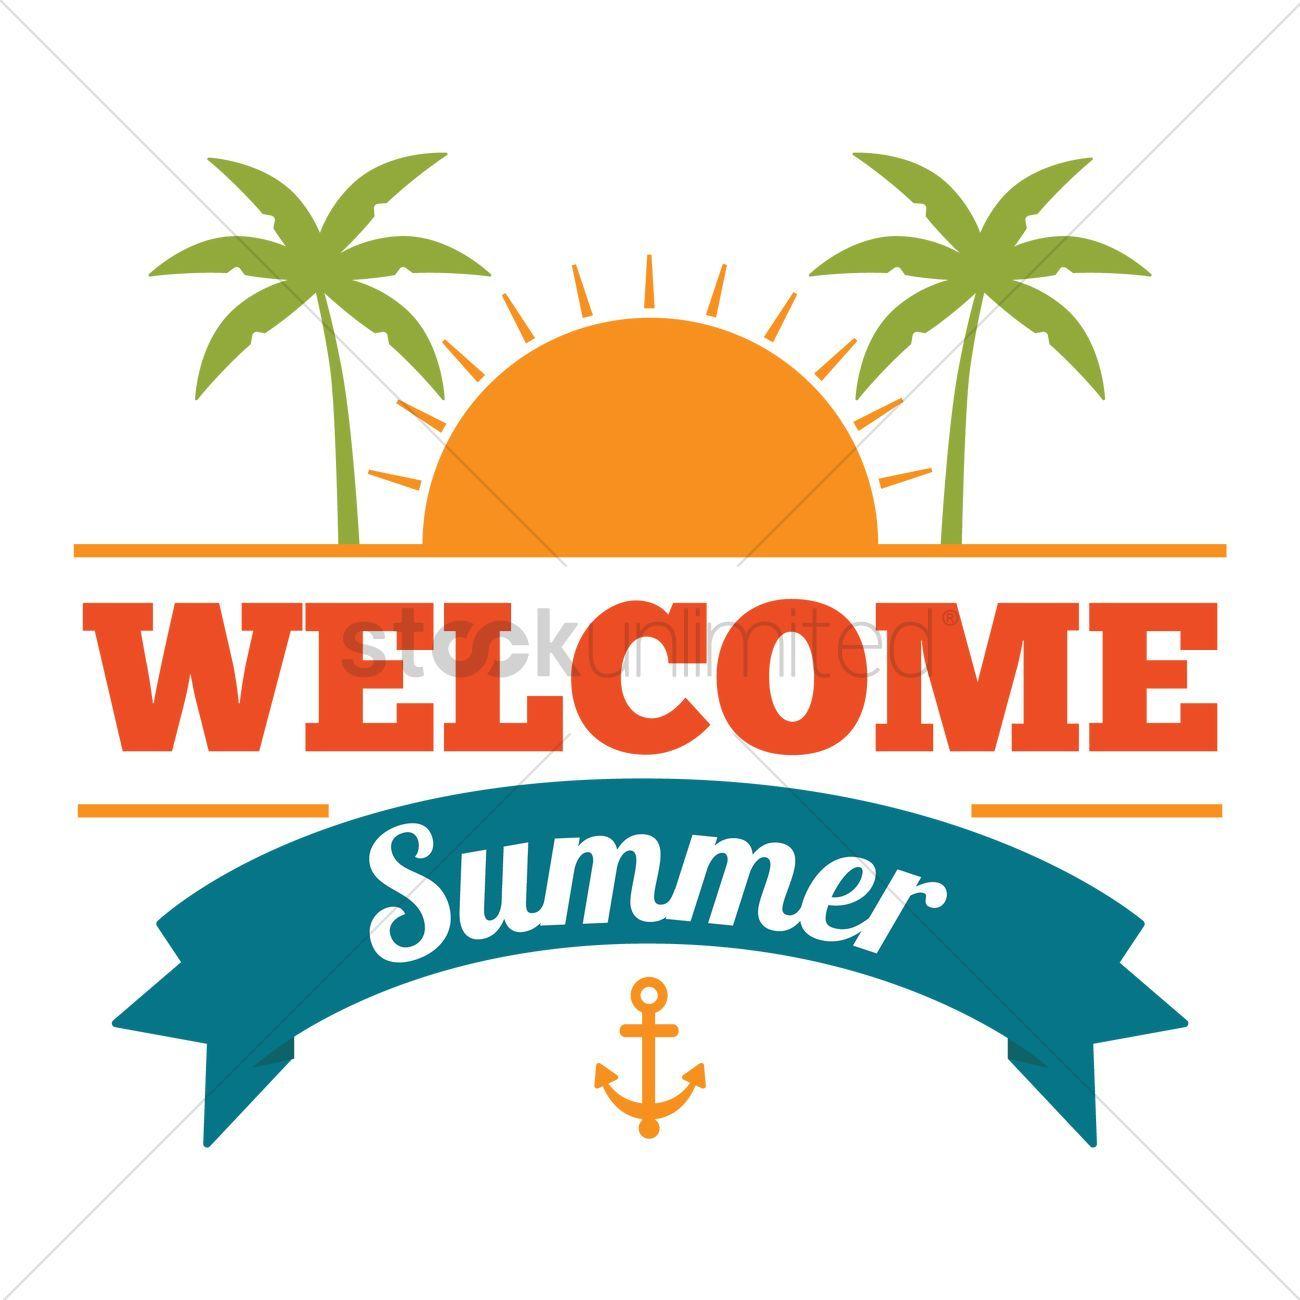 Welcome summer clipart 5 » Clipart Portal.